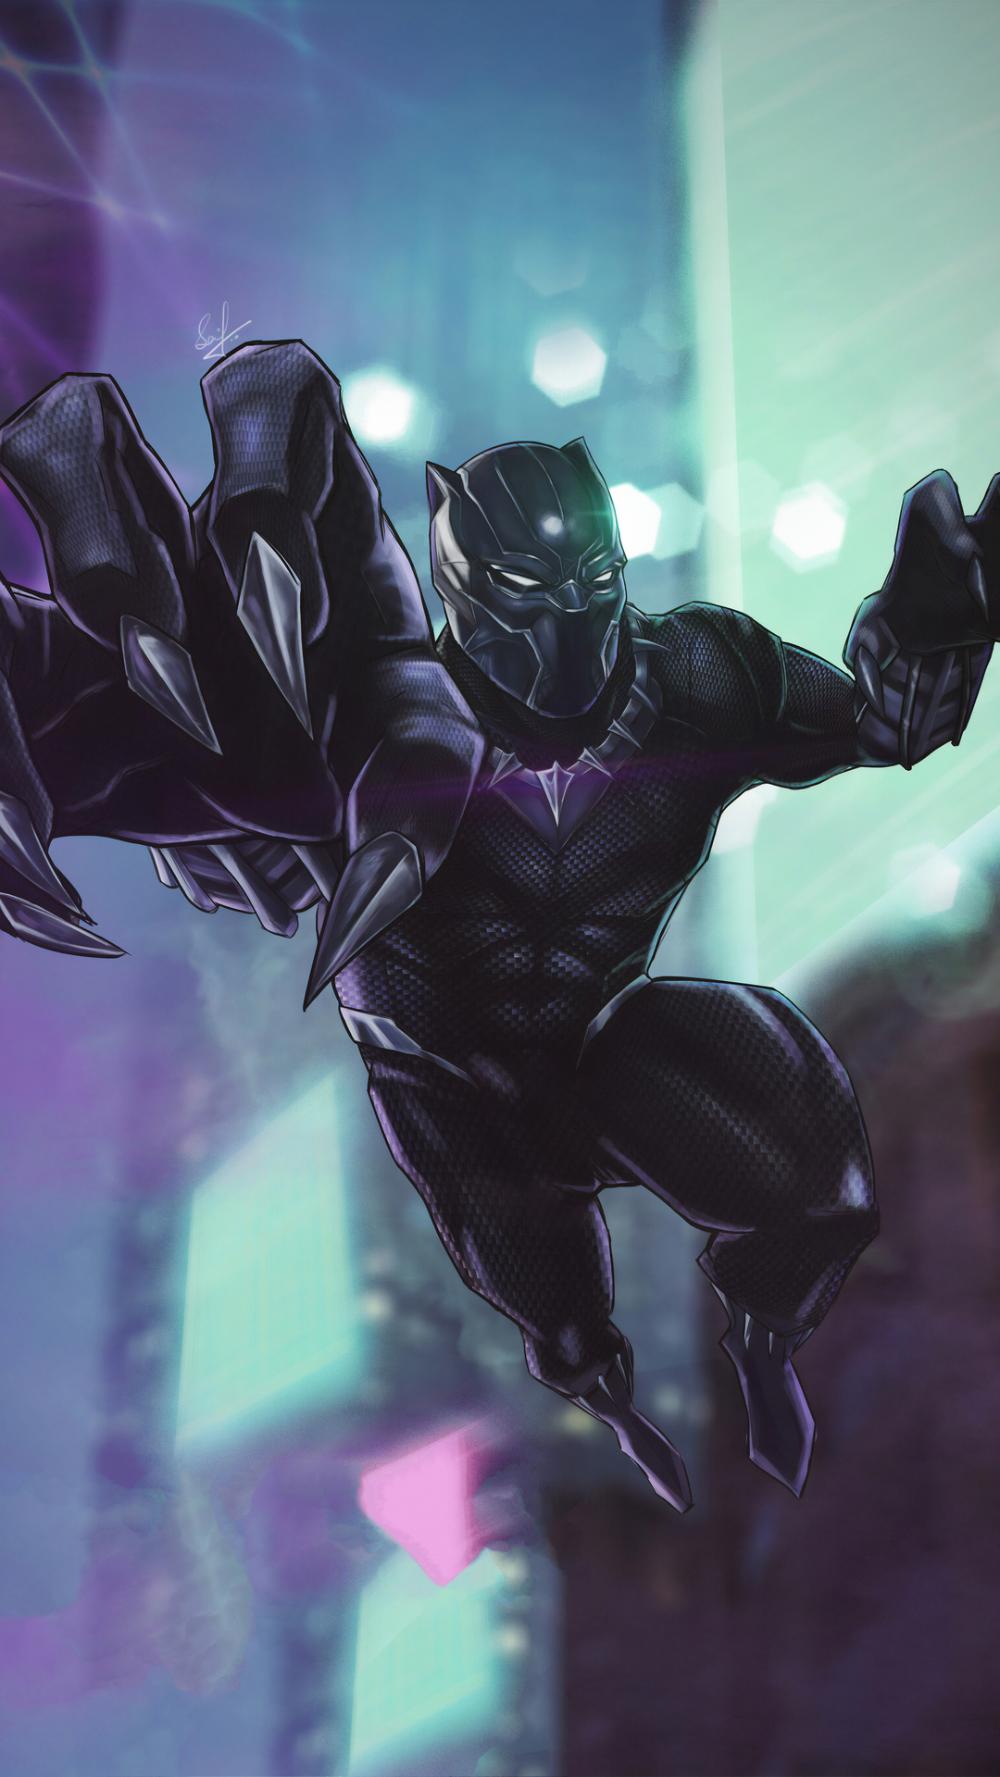 Black Panther in 2020 | Iphone wallpaper, Black panther ...